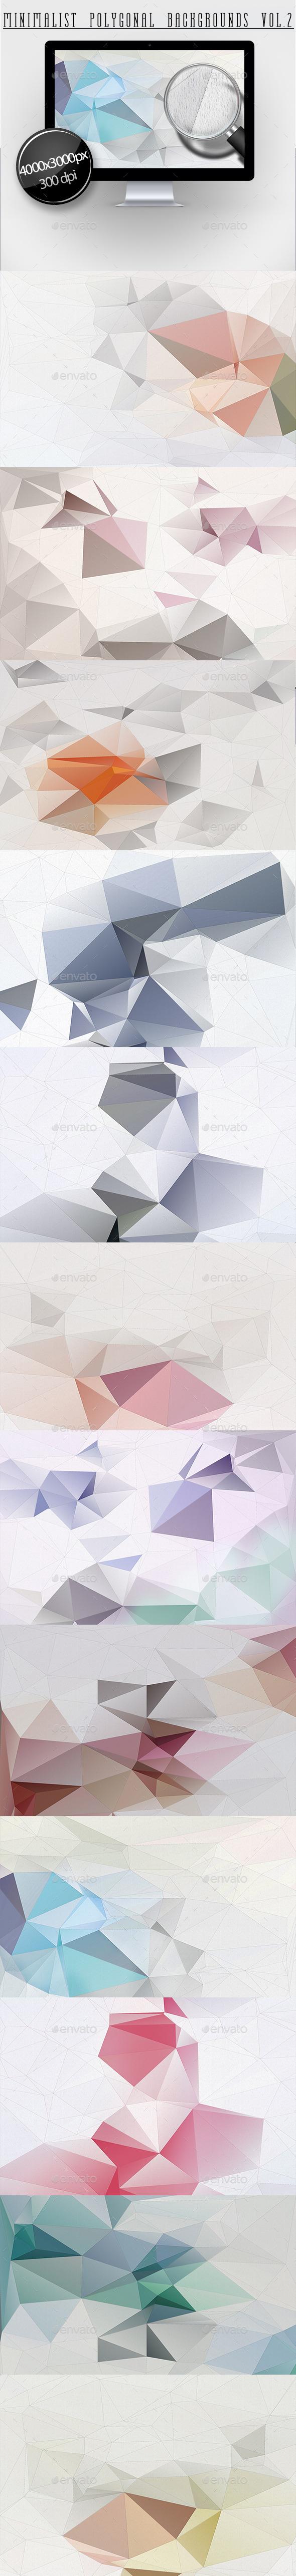 Minimalist Polygonal Backgrounds Vol.2